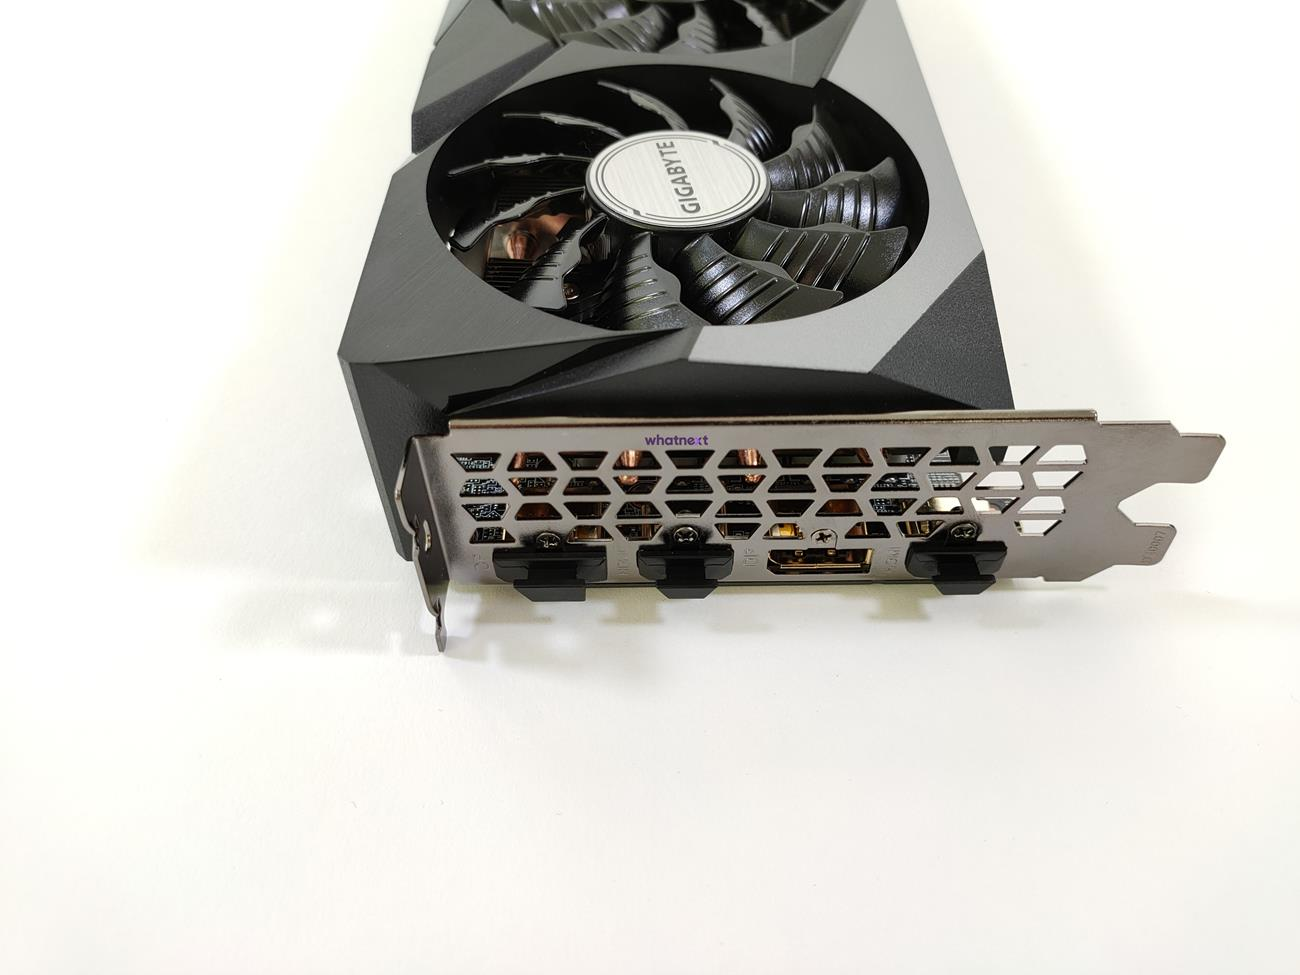 test Gigabyte GeForce RTX 3060 Ti Gaming OC Pro 8G, recenzja Gigabyte GeForce RTX 3060 Ti Gaming OC Pro 8G, review Gigabyte GeForce RTX 3060 Ti Gaming OC Pro 8G, opinia Gigabyte GeForce RTX 3060 Ti Gaming OC Pro 8G